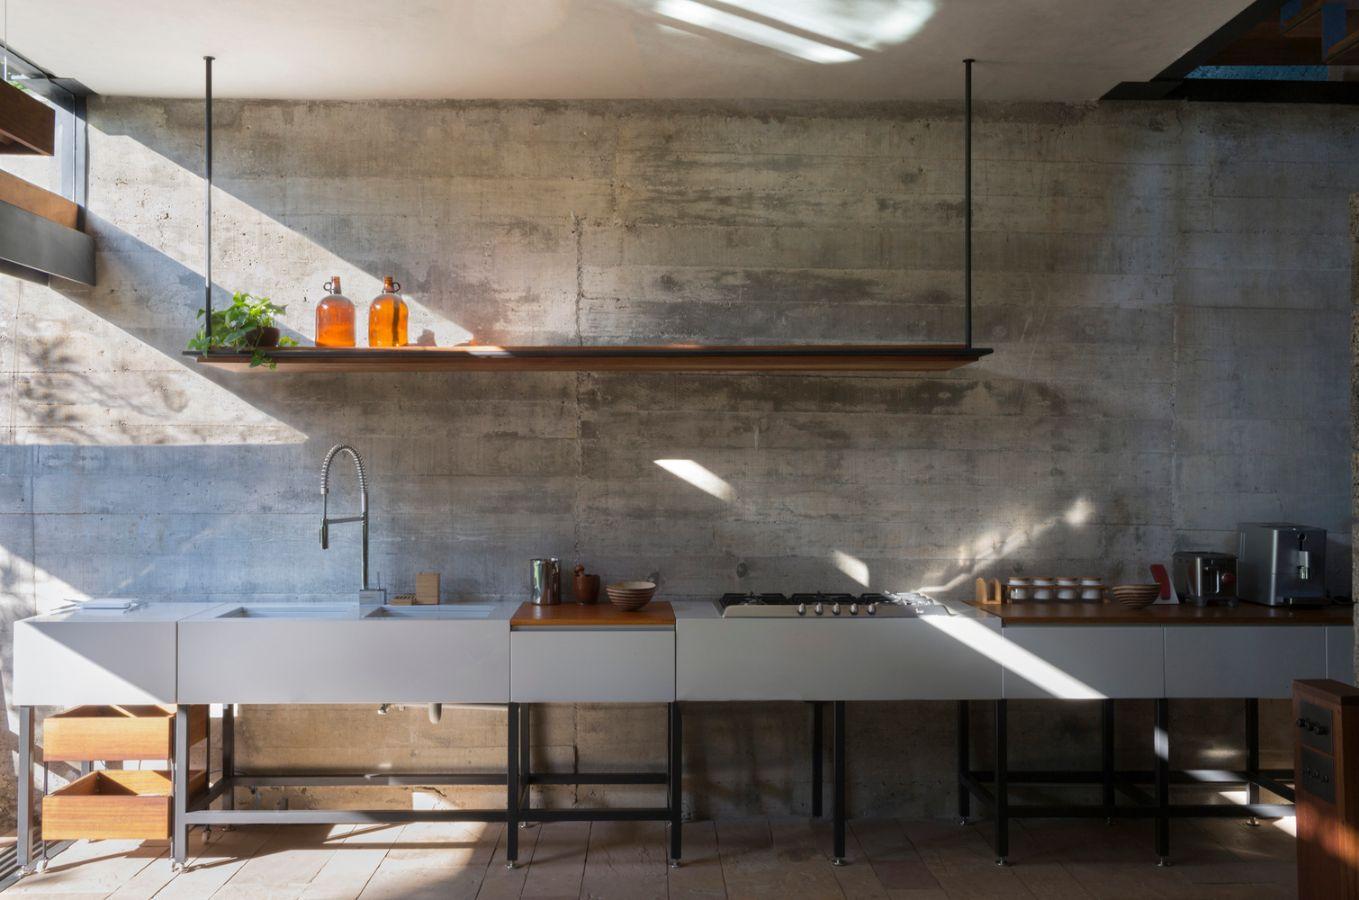 8_Albino Ortega House_Rozana Montiel_Inspirationist